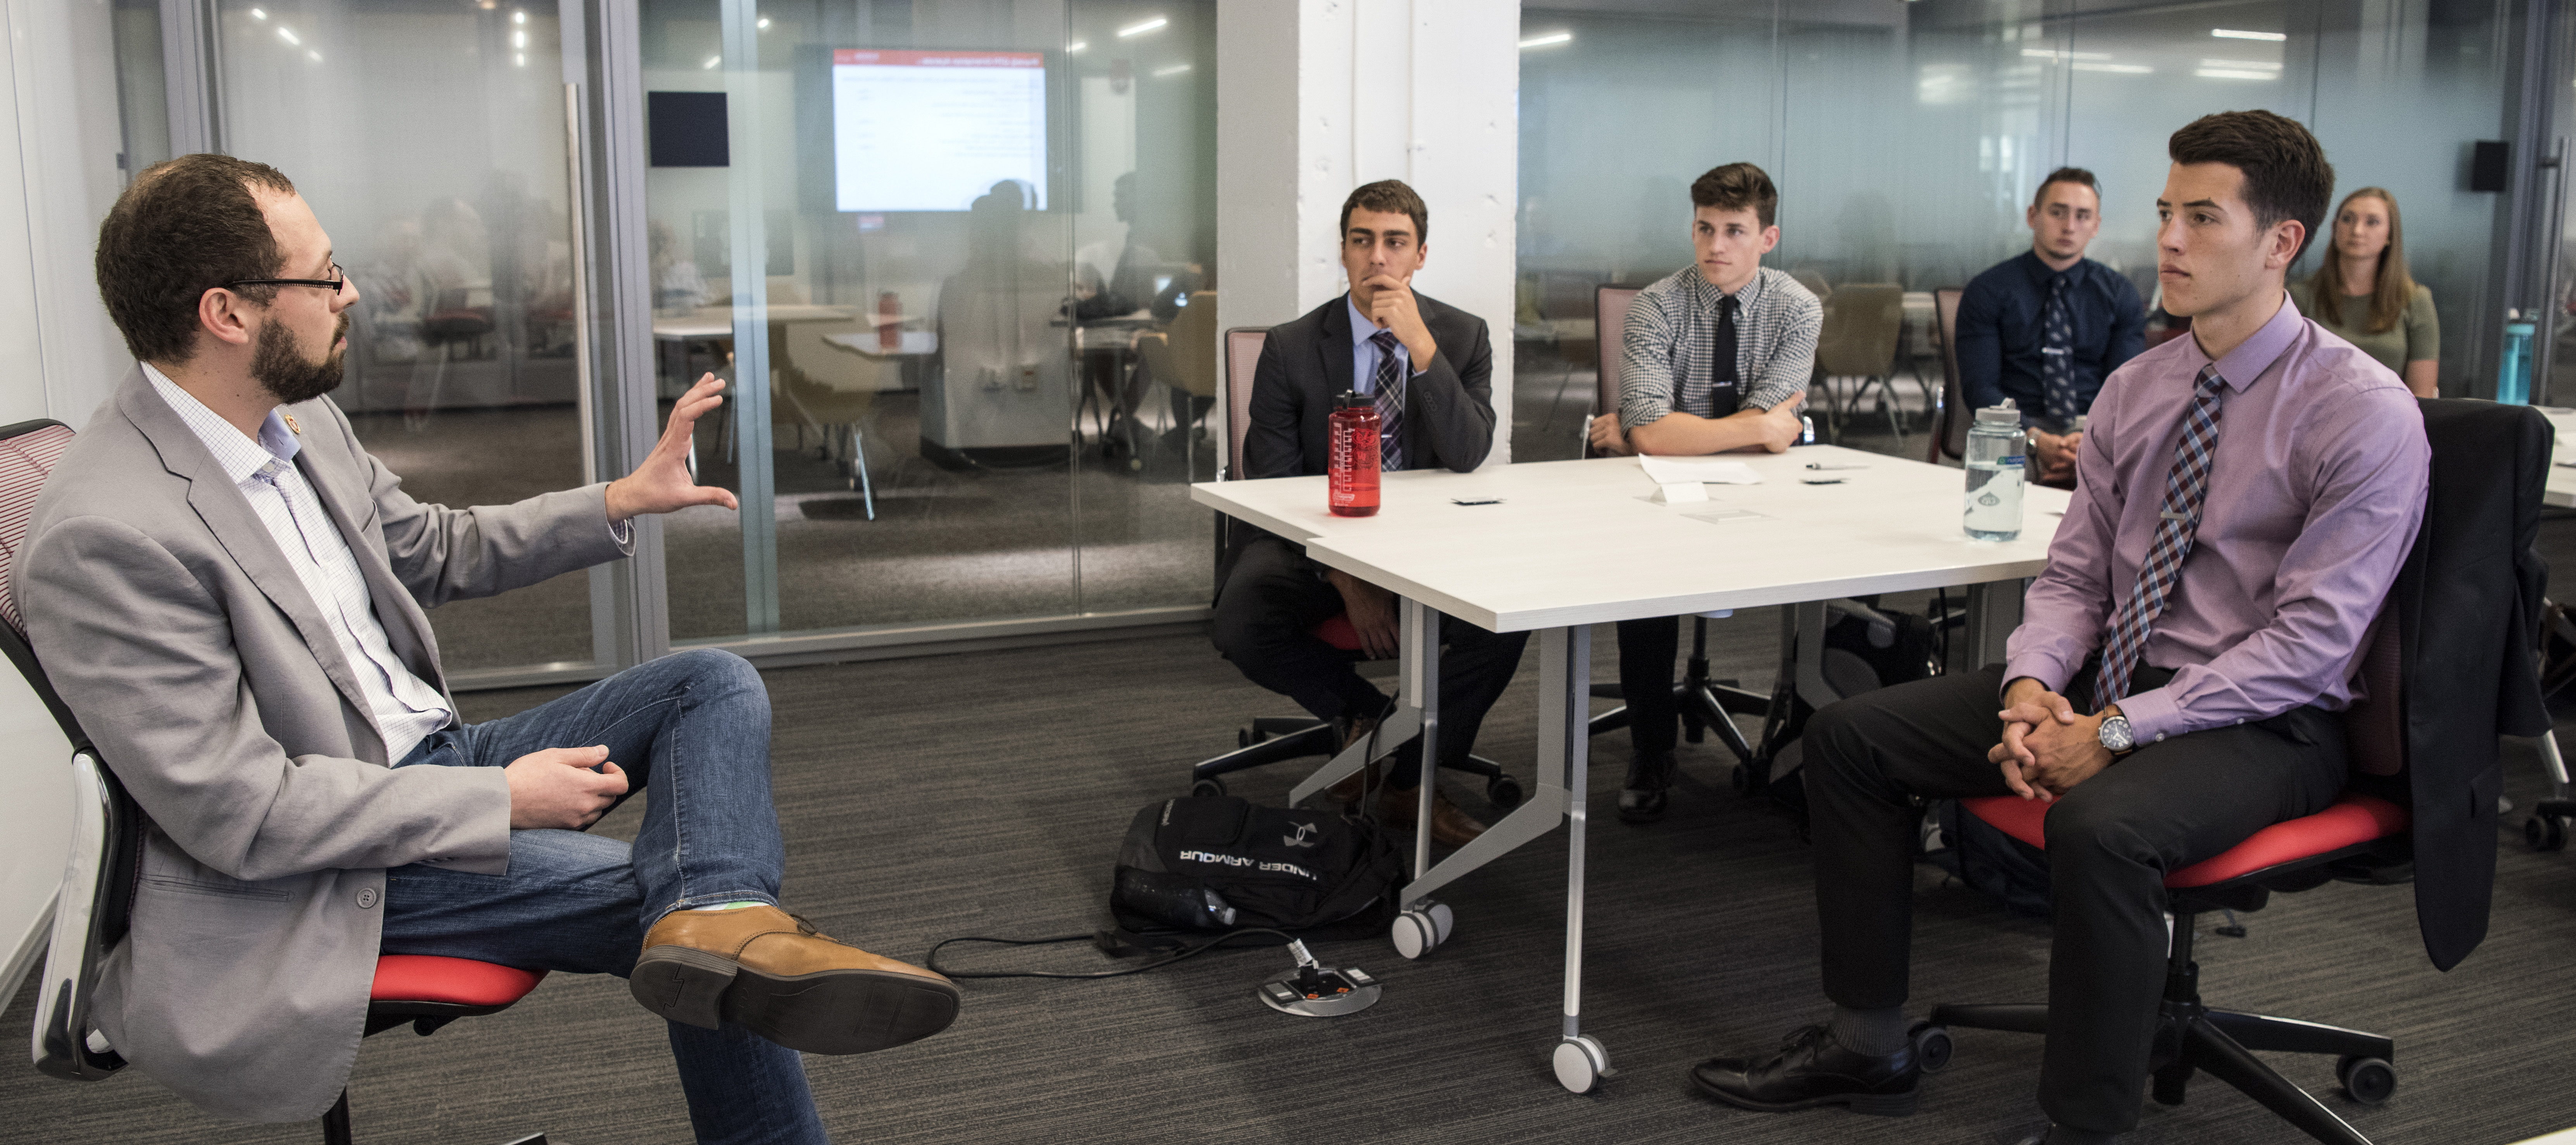 PharmD students at orientation for a new business option in the PharmD program